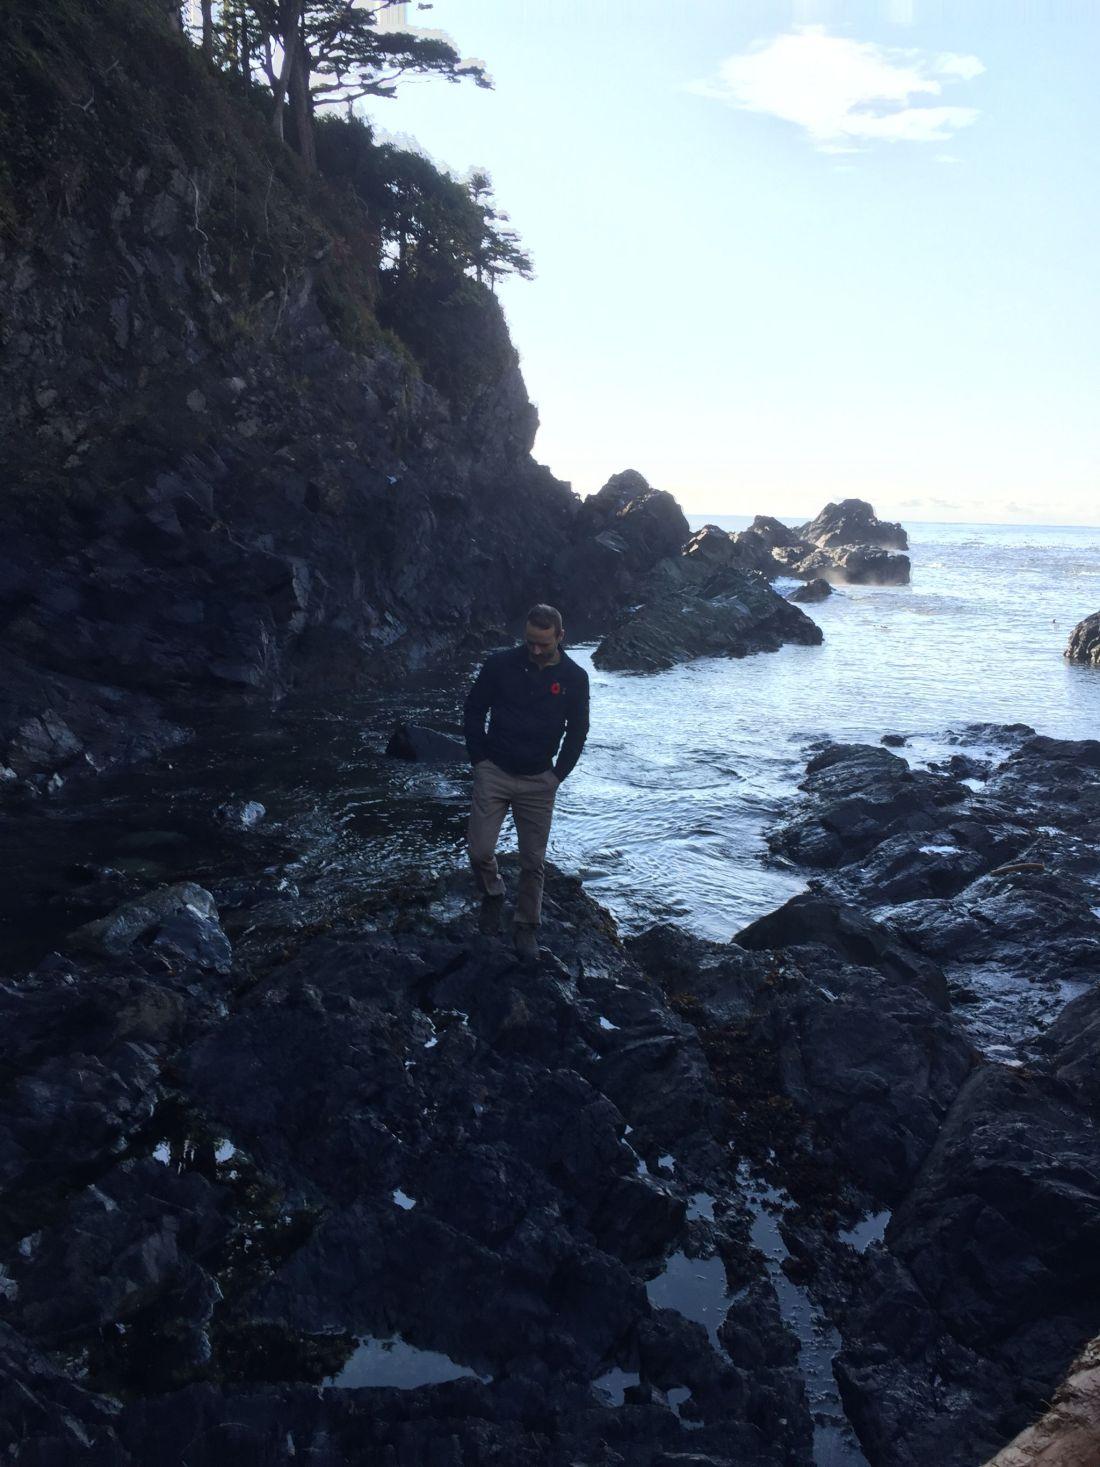 On the beach near Black Rock Resort, Ucluelet